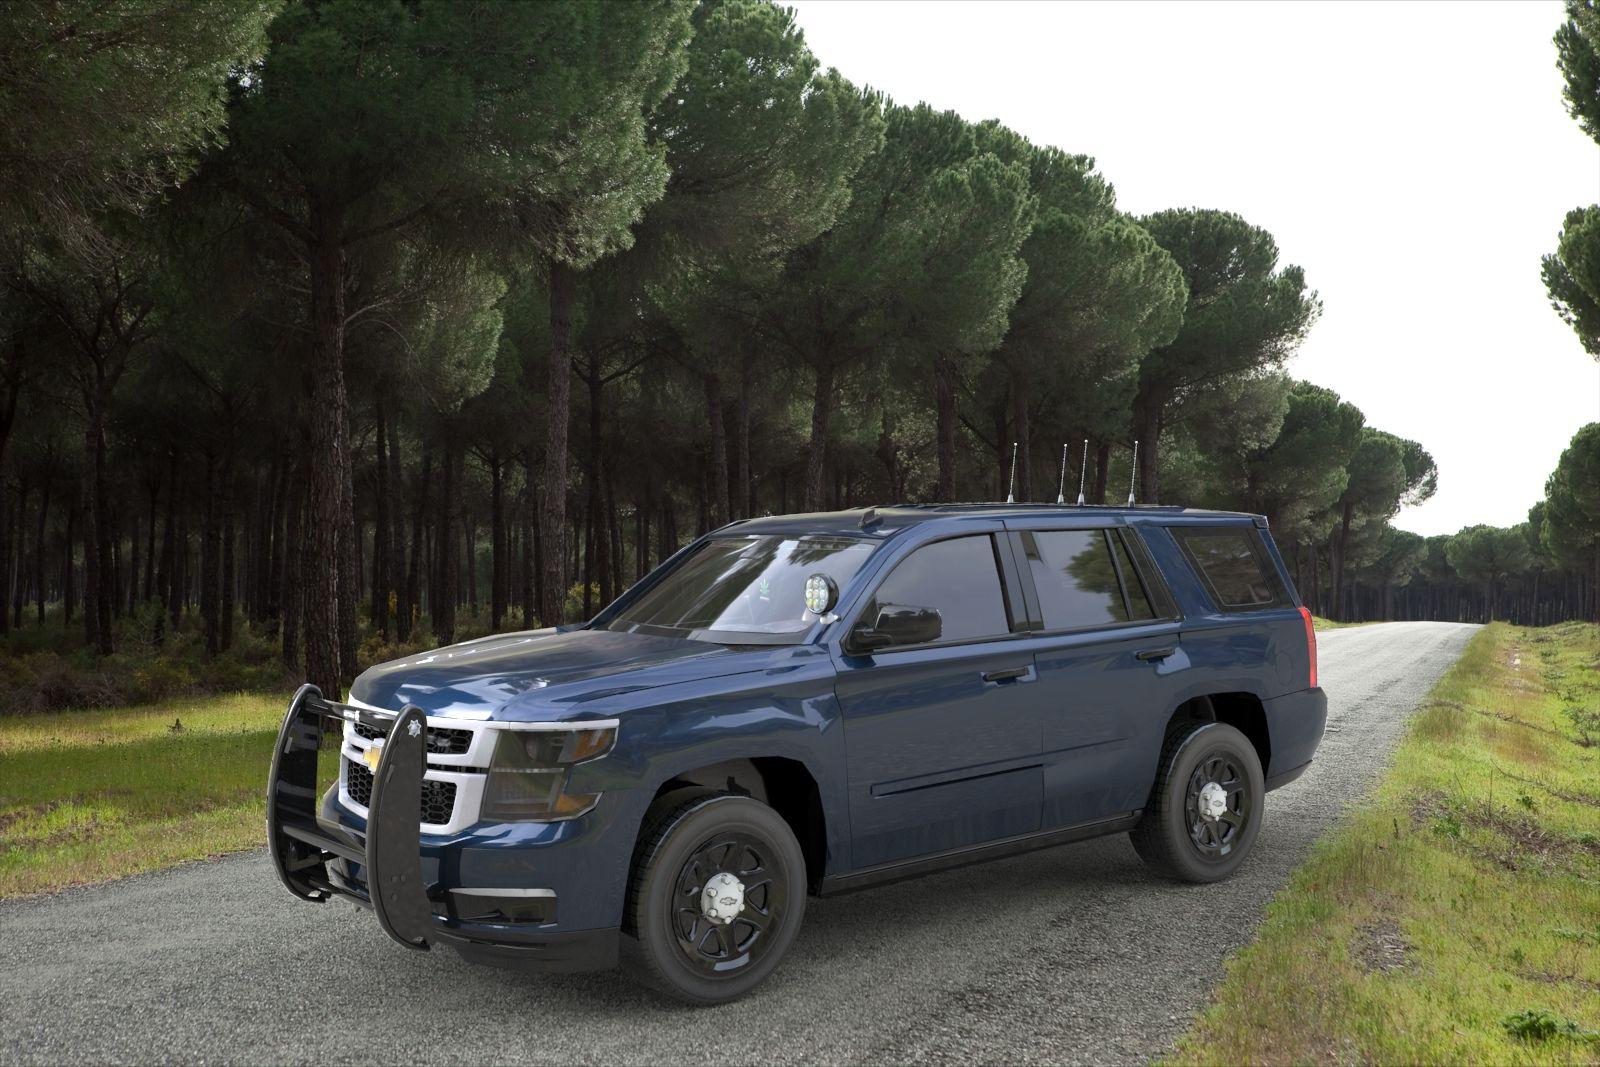 2010 Chevy Tahoe Ppv Car Wheels Car Wheels Rims Car Wheels Diy